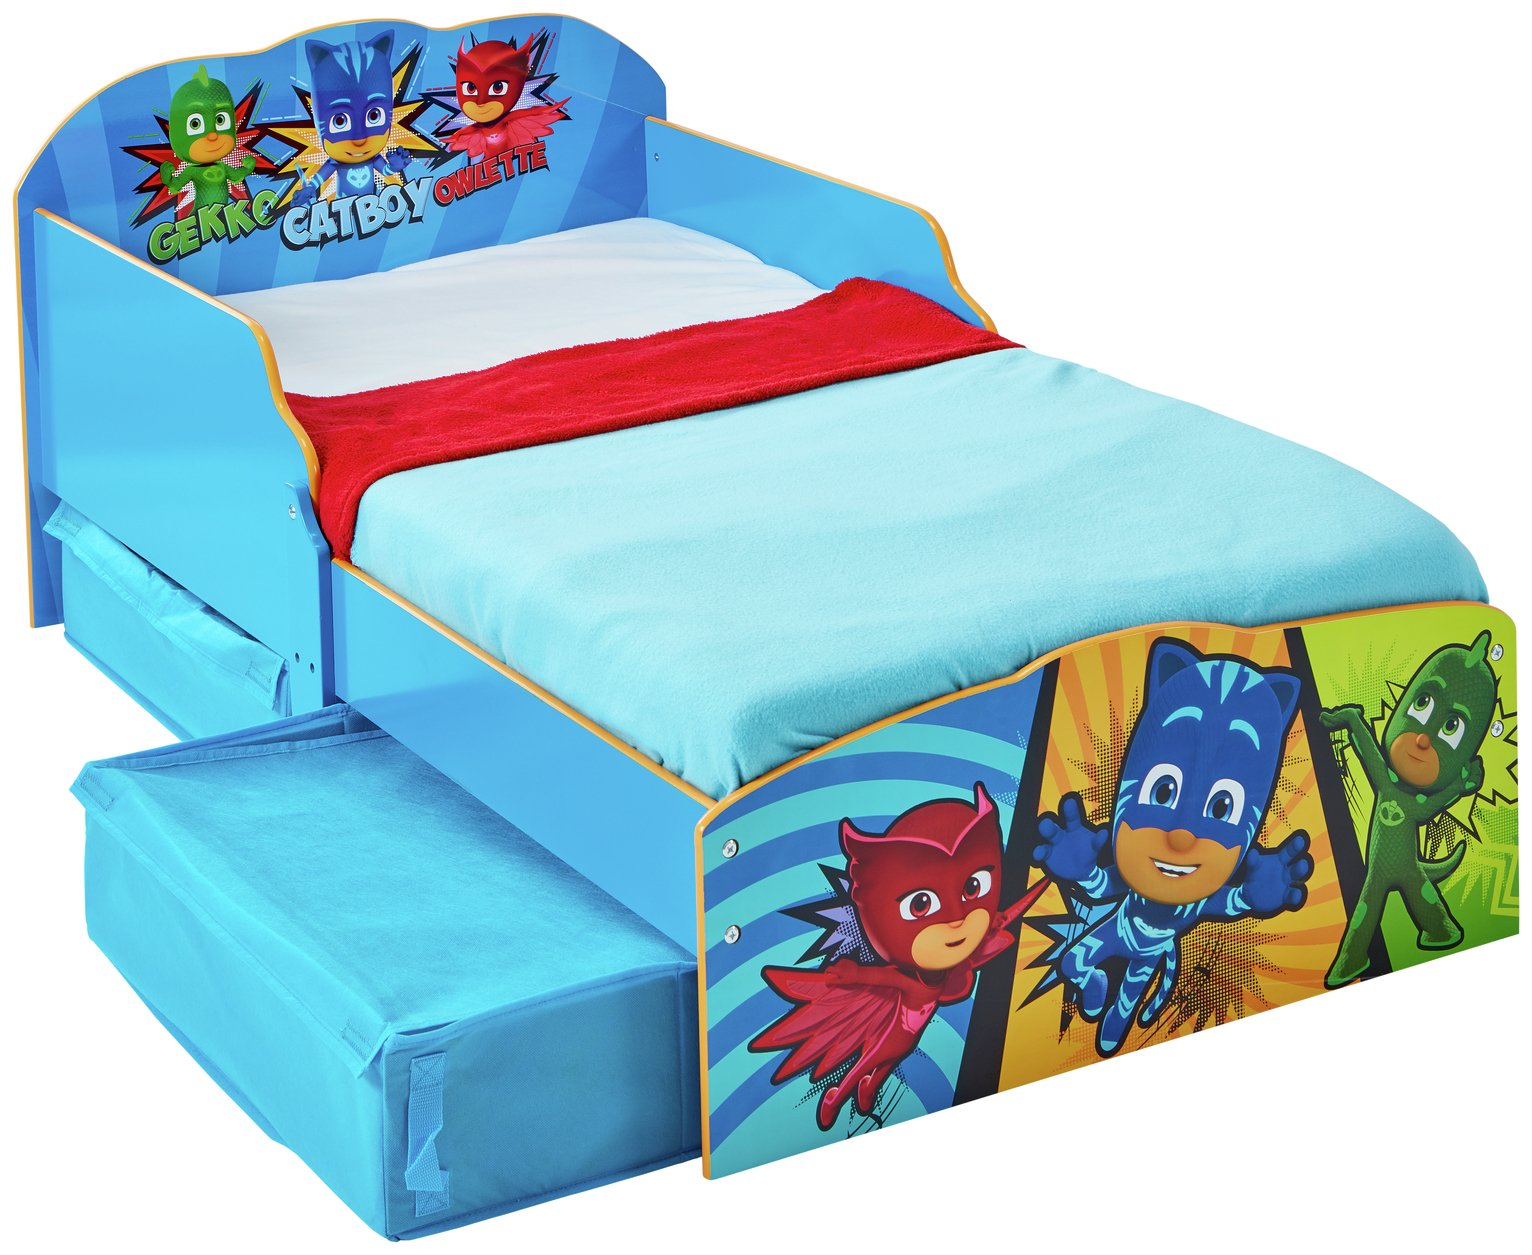 Argos Home PJ Masks Toddler Bed with Underbed Storage